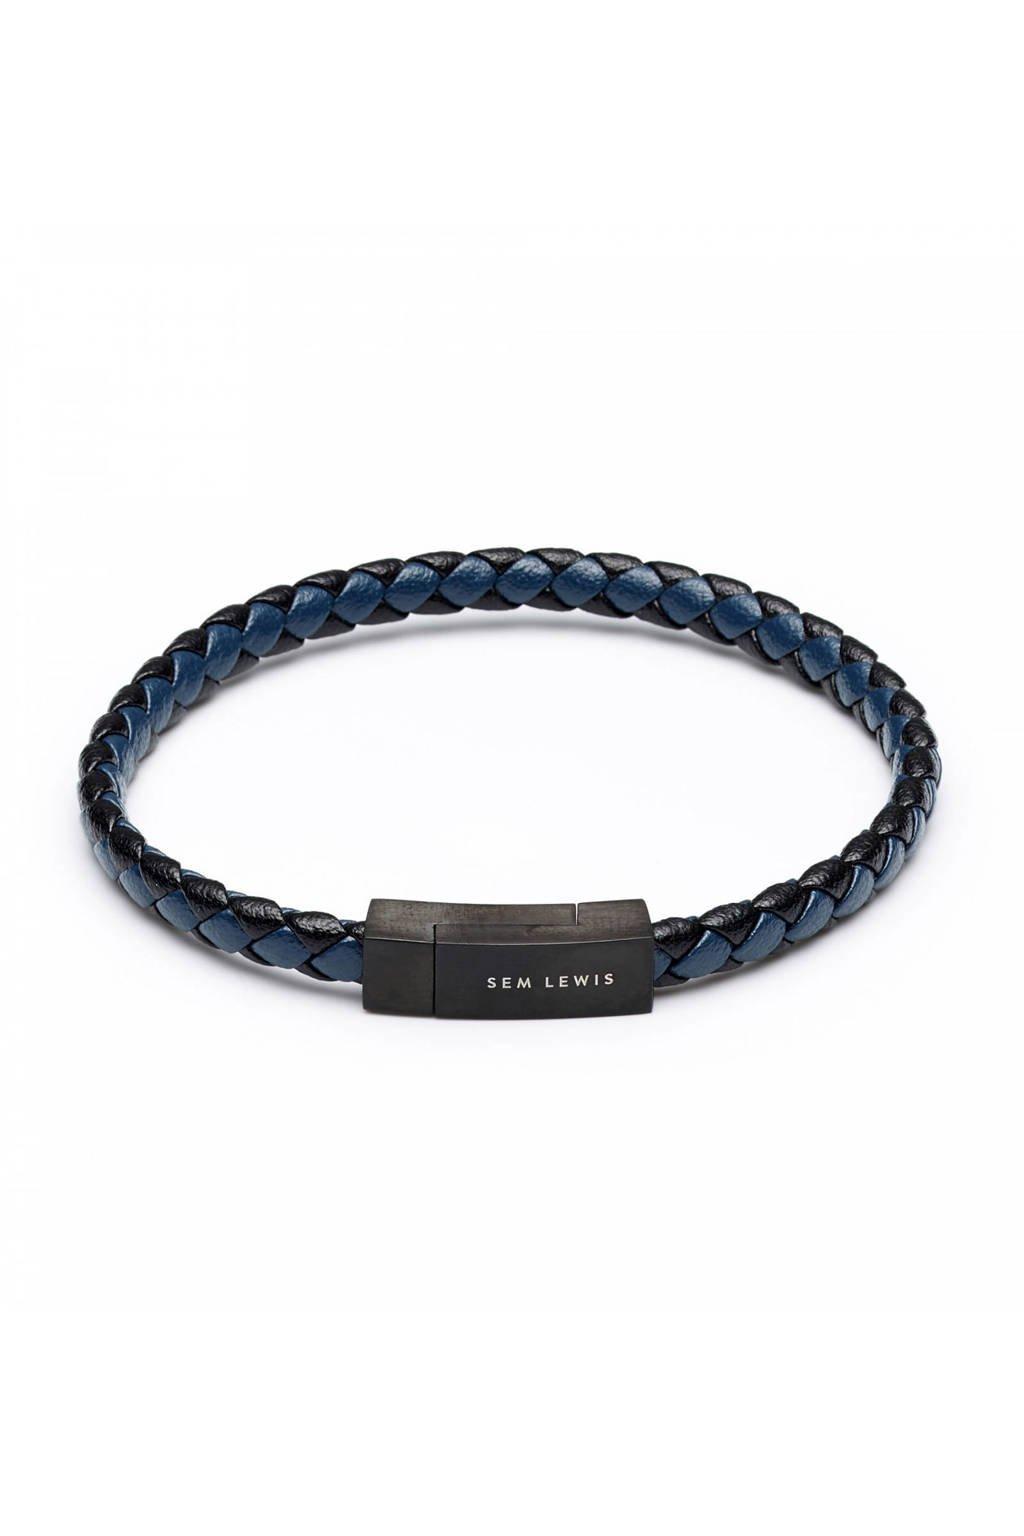 Sem Lewis armband SL210004, Blauw, zwart